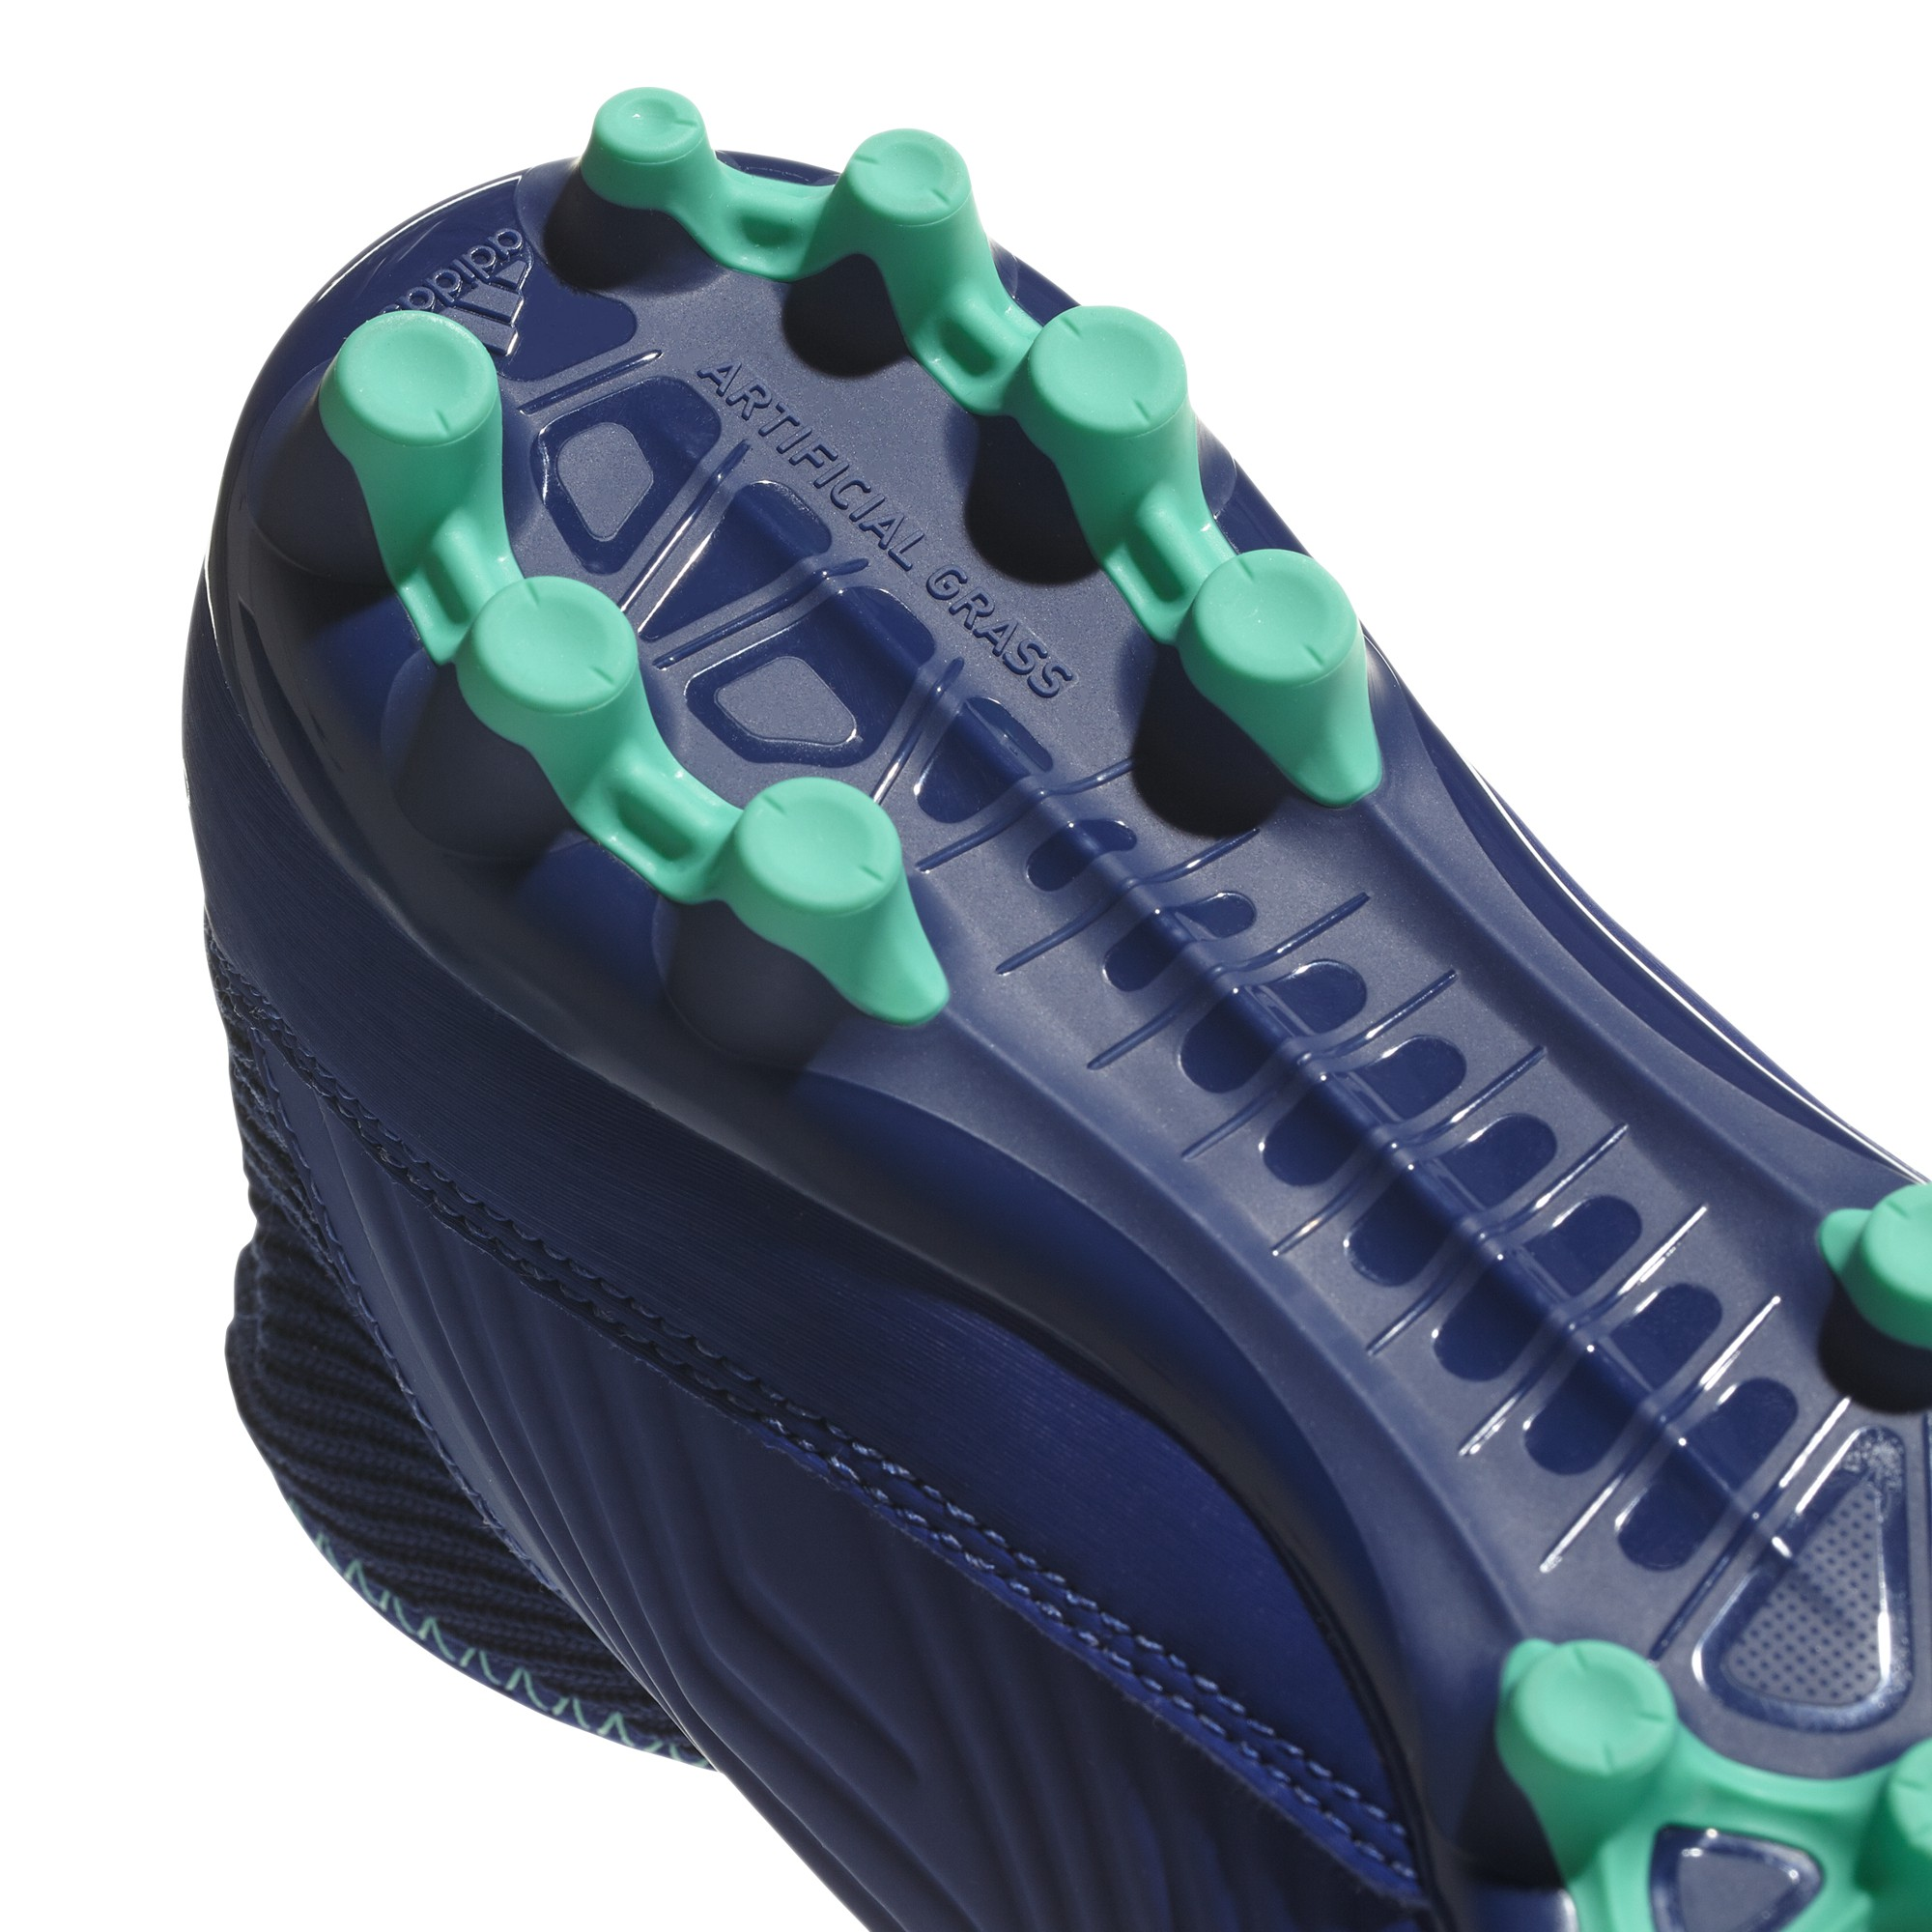 6639cf2373253 Bota de Fútbol Adidas Predator 18.3 Césped Artificial - Deportes Moya